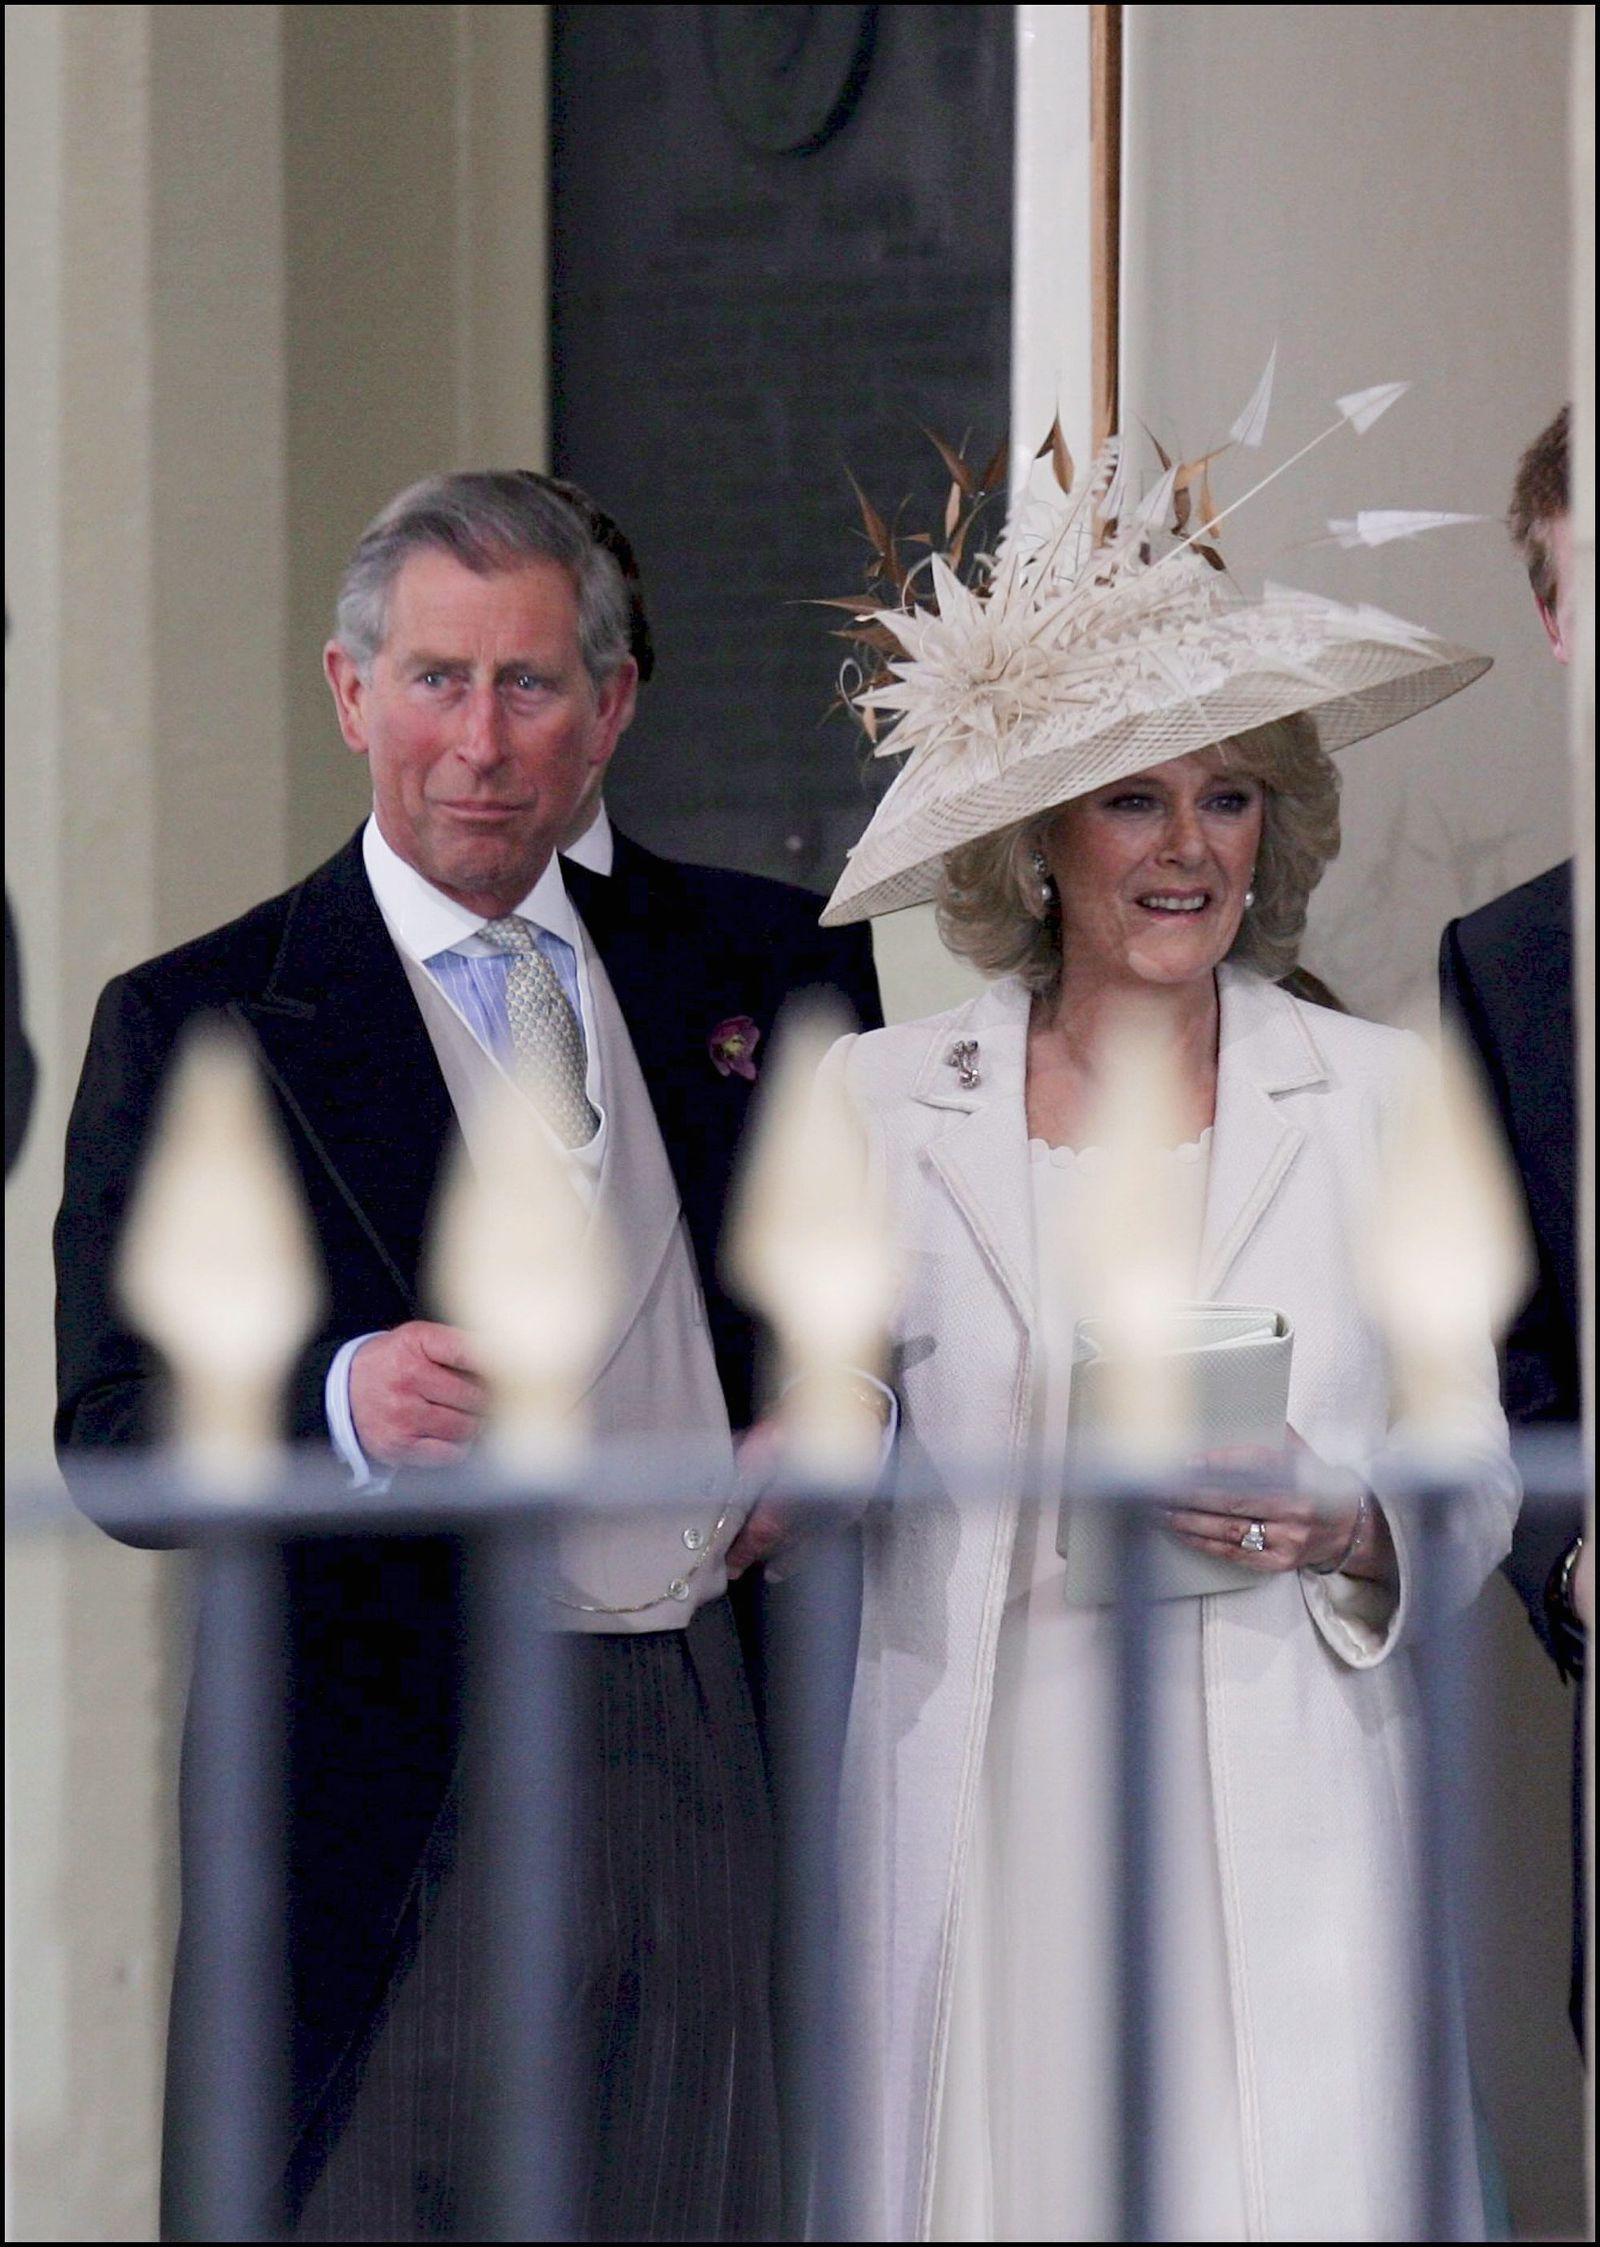 Prince Charles and Camilla Parker Bowles' Wedding Had to